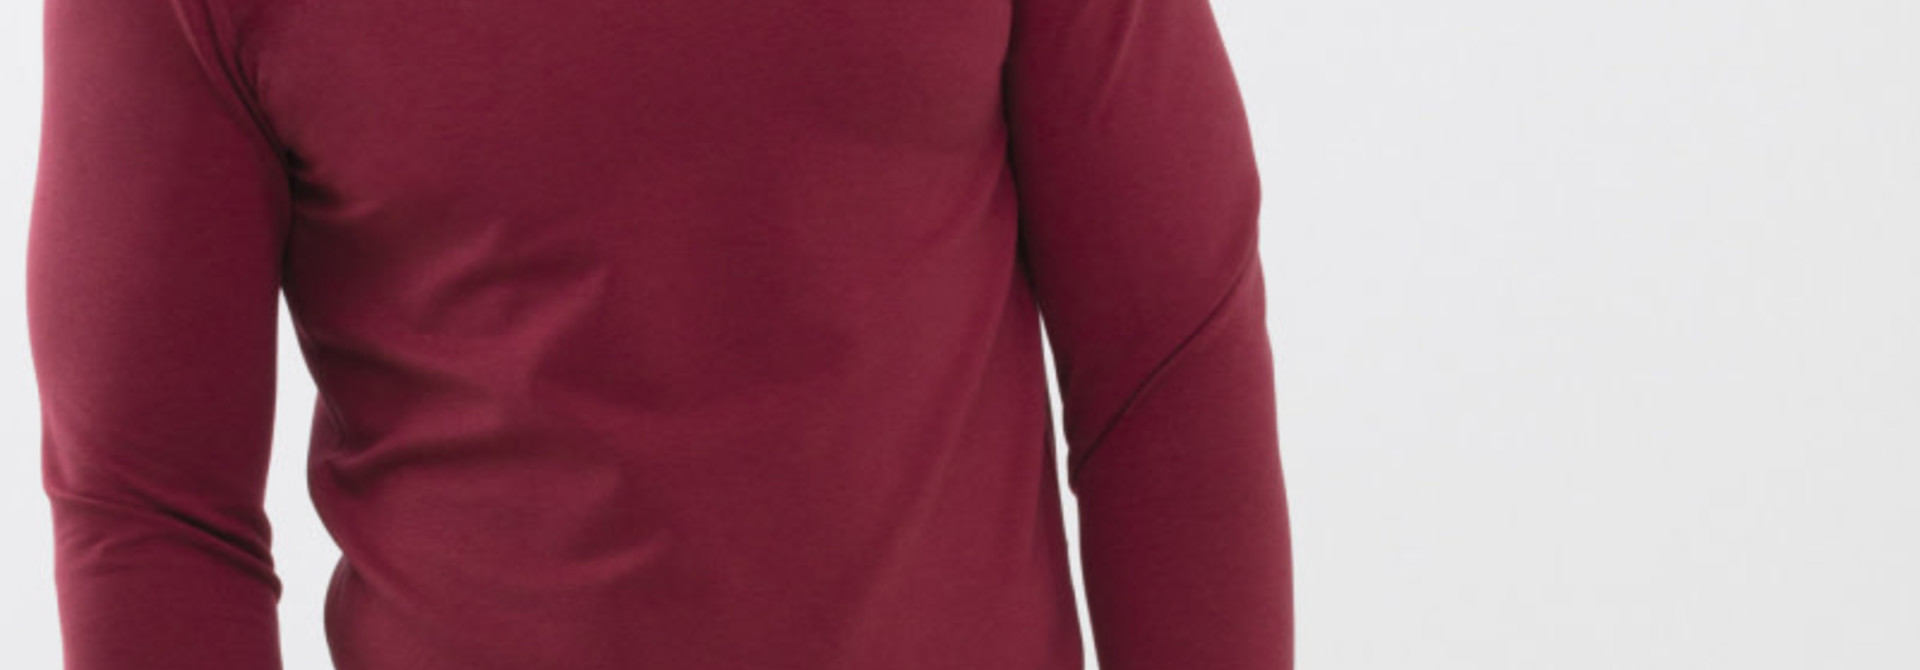 Homewear Enjoy sweater 23540 - winter Cherry